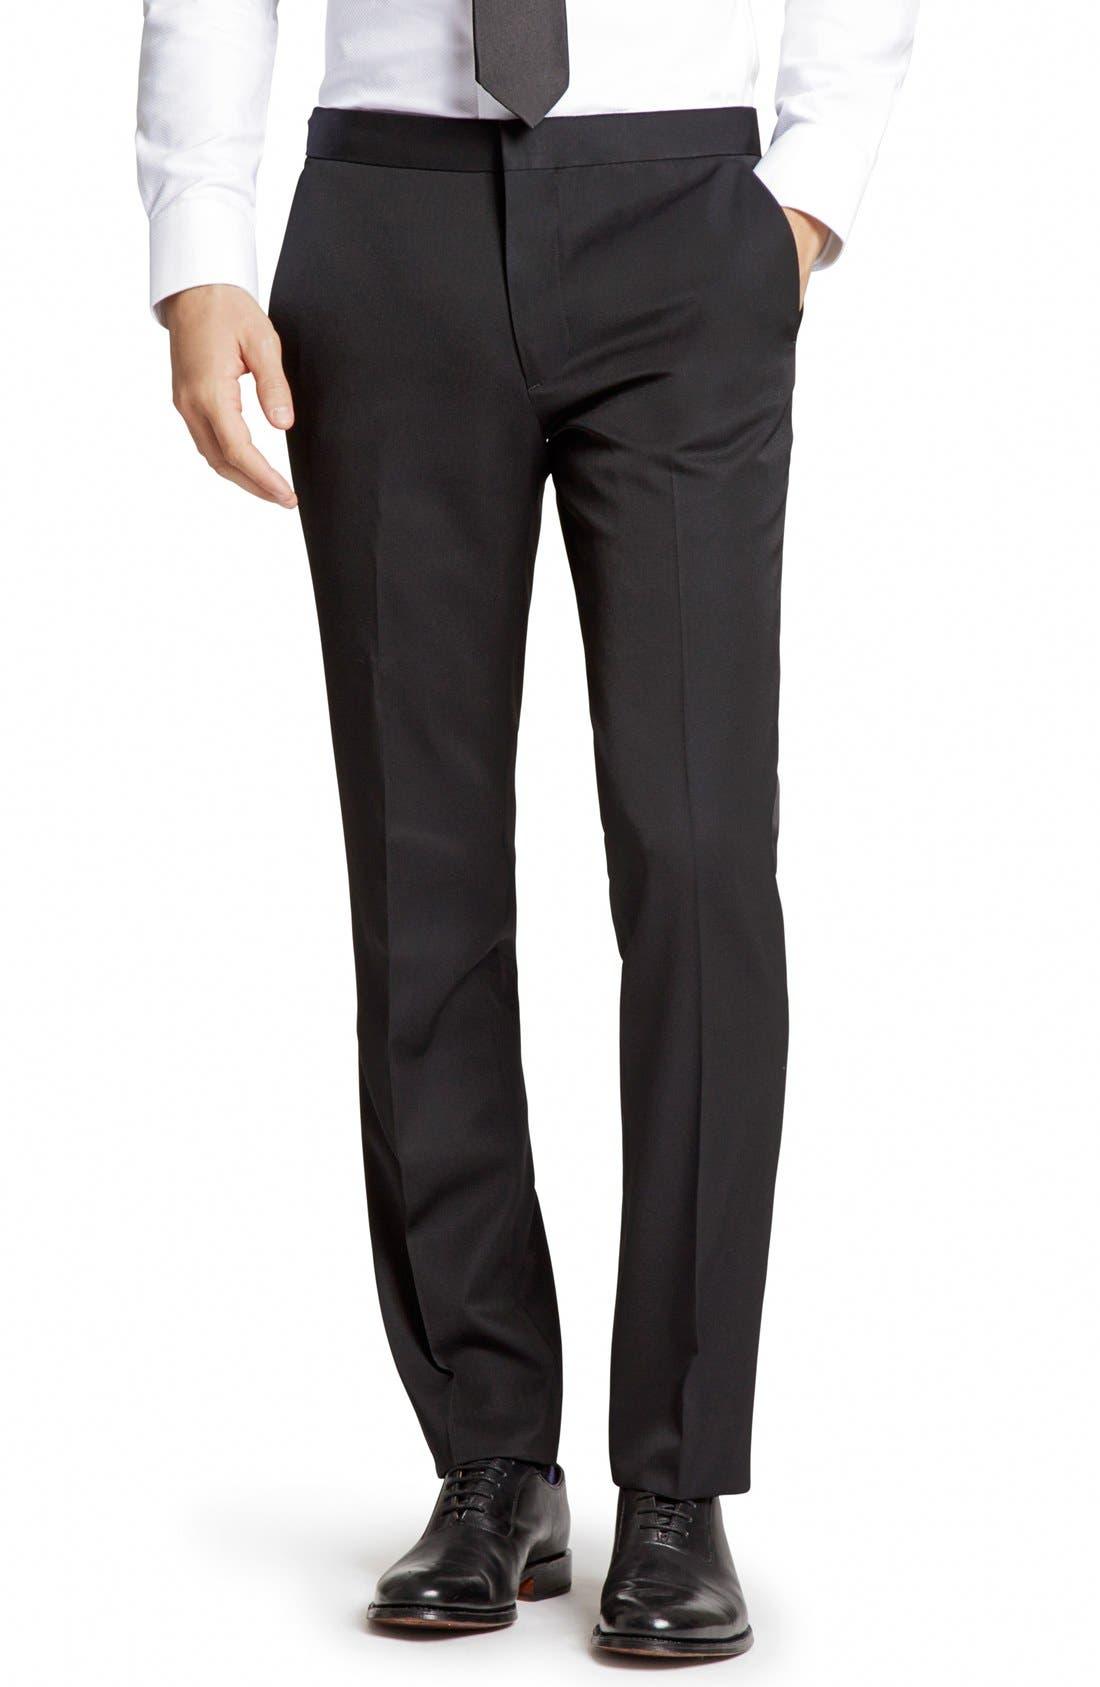 Main Image - Bonobos Flat Front Wool Tuxedo Trousers